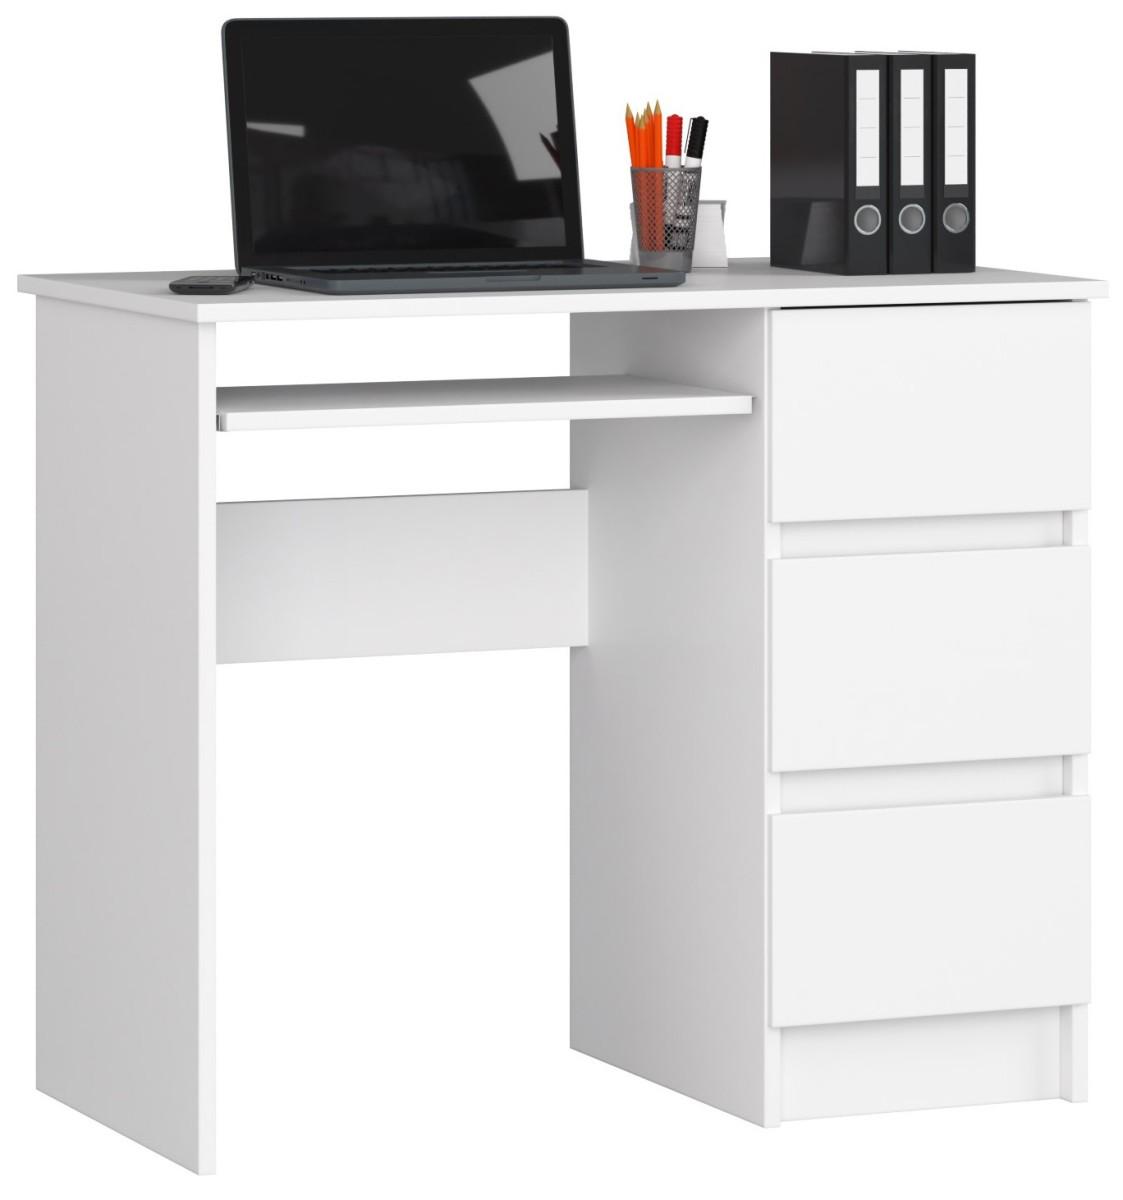 Písací stôl A-6 90 cm biely pravý